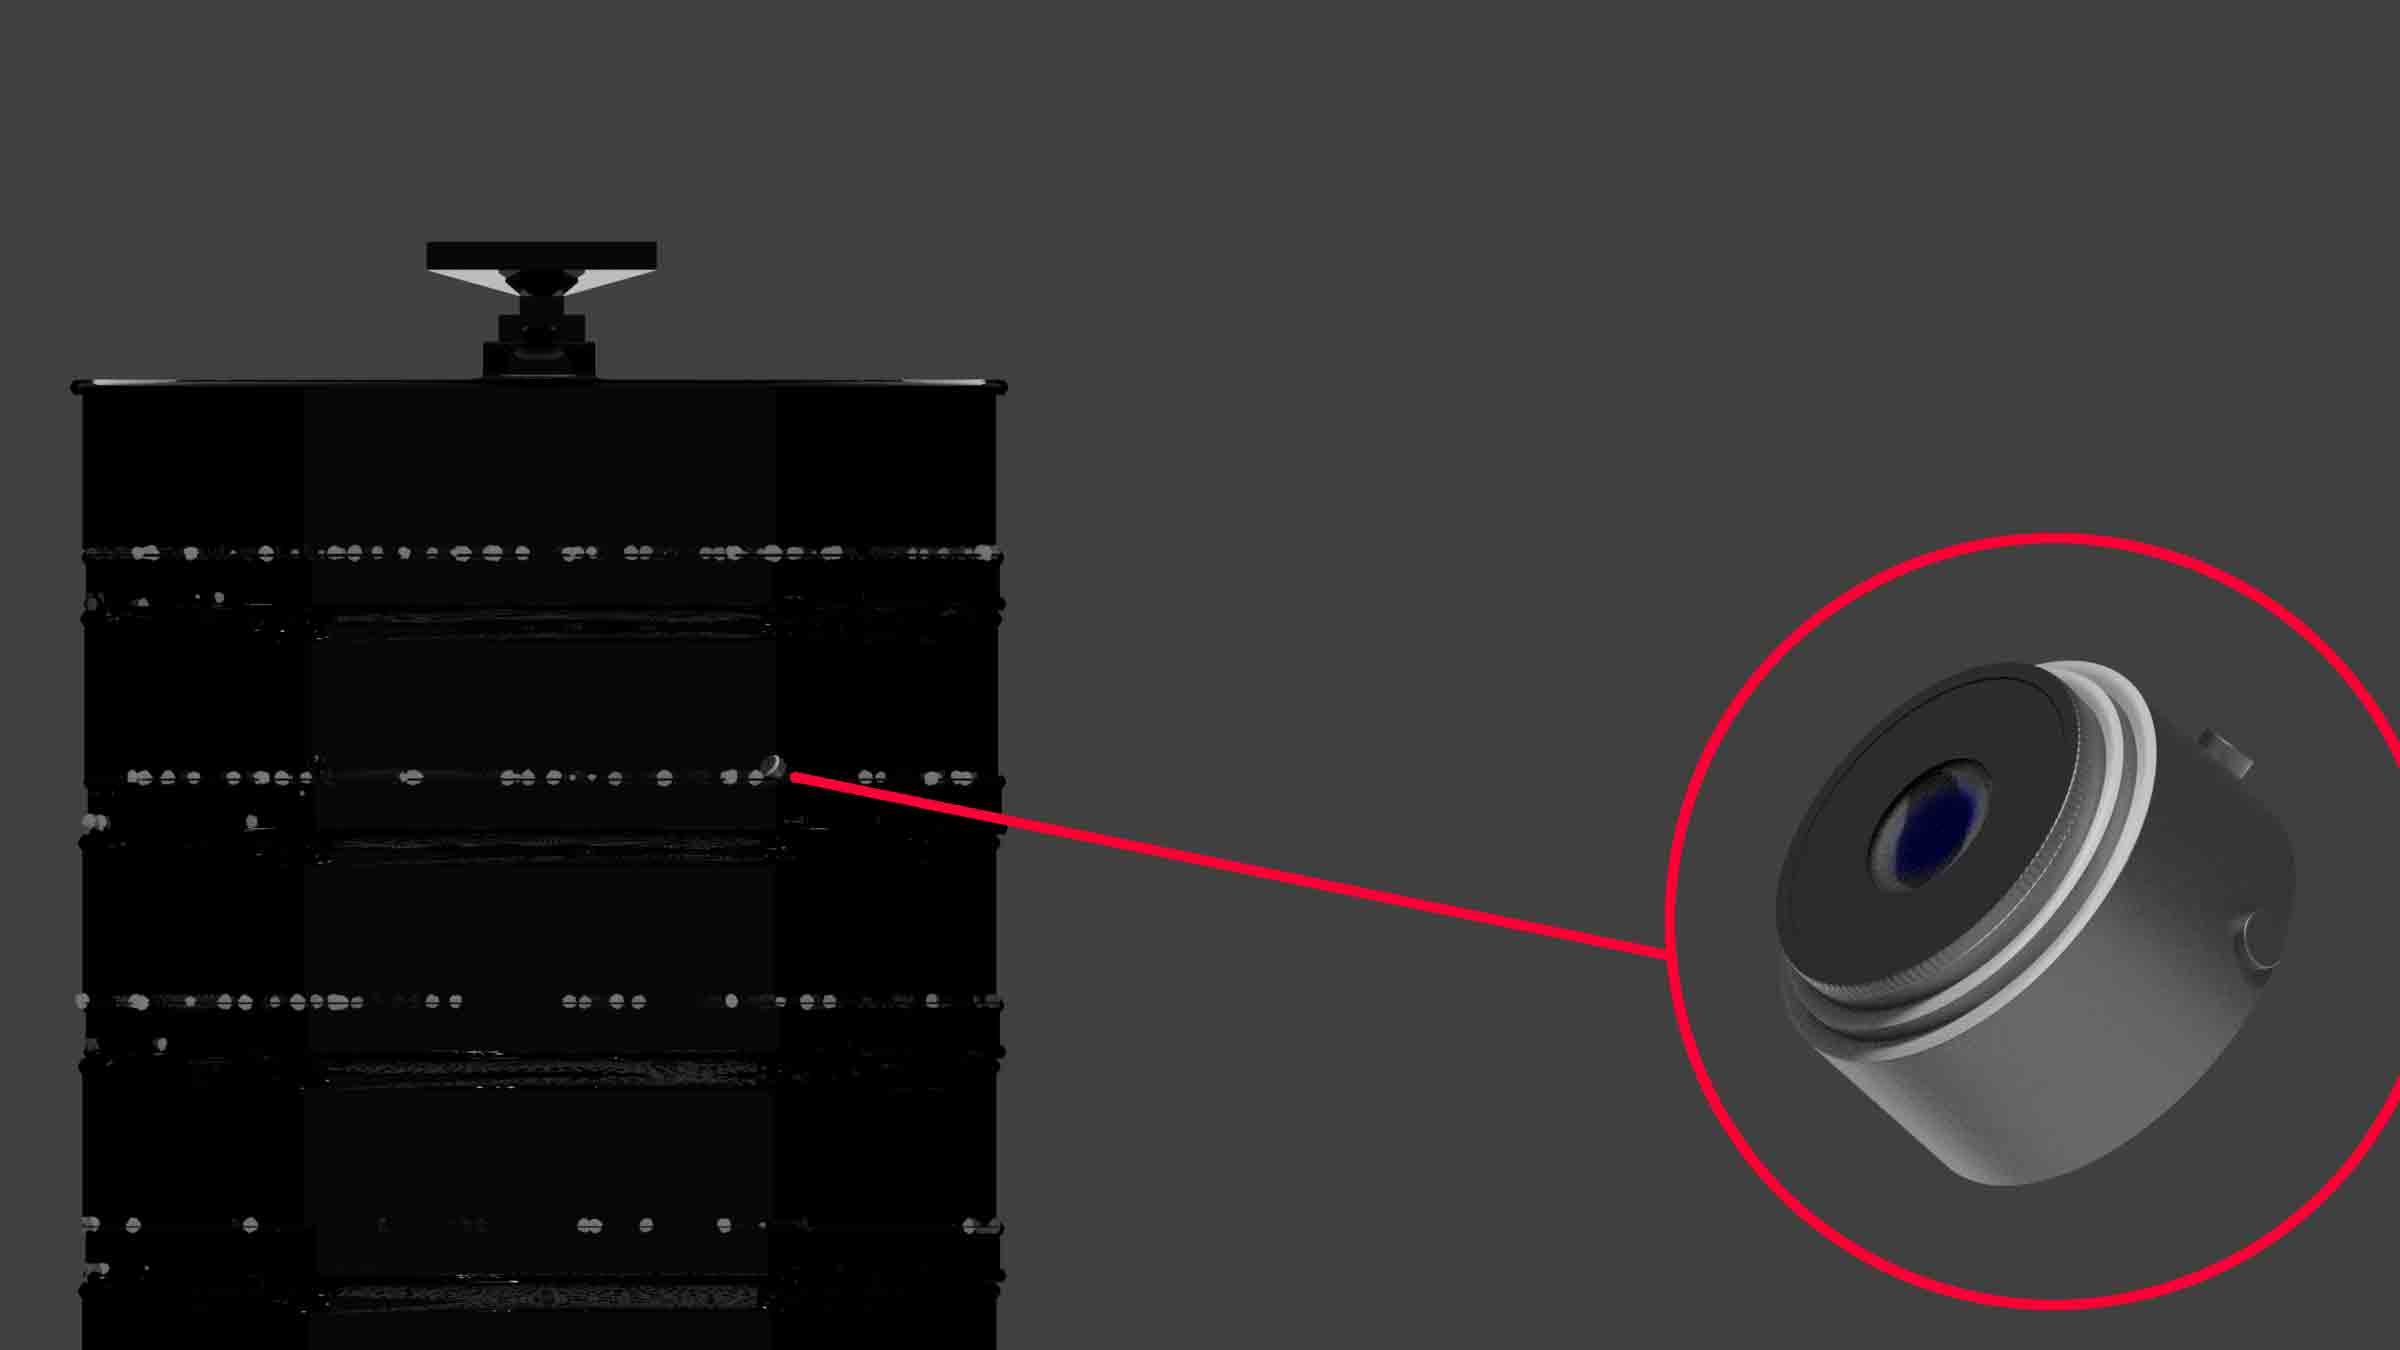 60X72 A.Monamour Pared De Ladrillo De Piedra Blanca Tel/ón De Fondo Tela De Impresi/ón 3D Impermeable Resistente Al Moho Tela De Poli/éster Resistente Cortina De Ducha De Ba/ño 150X180 cm